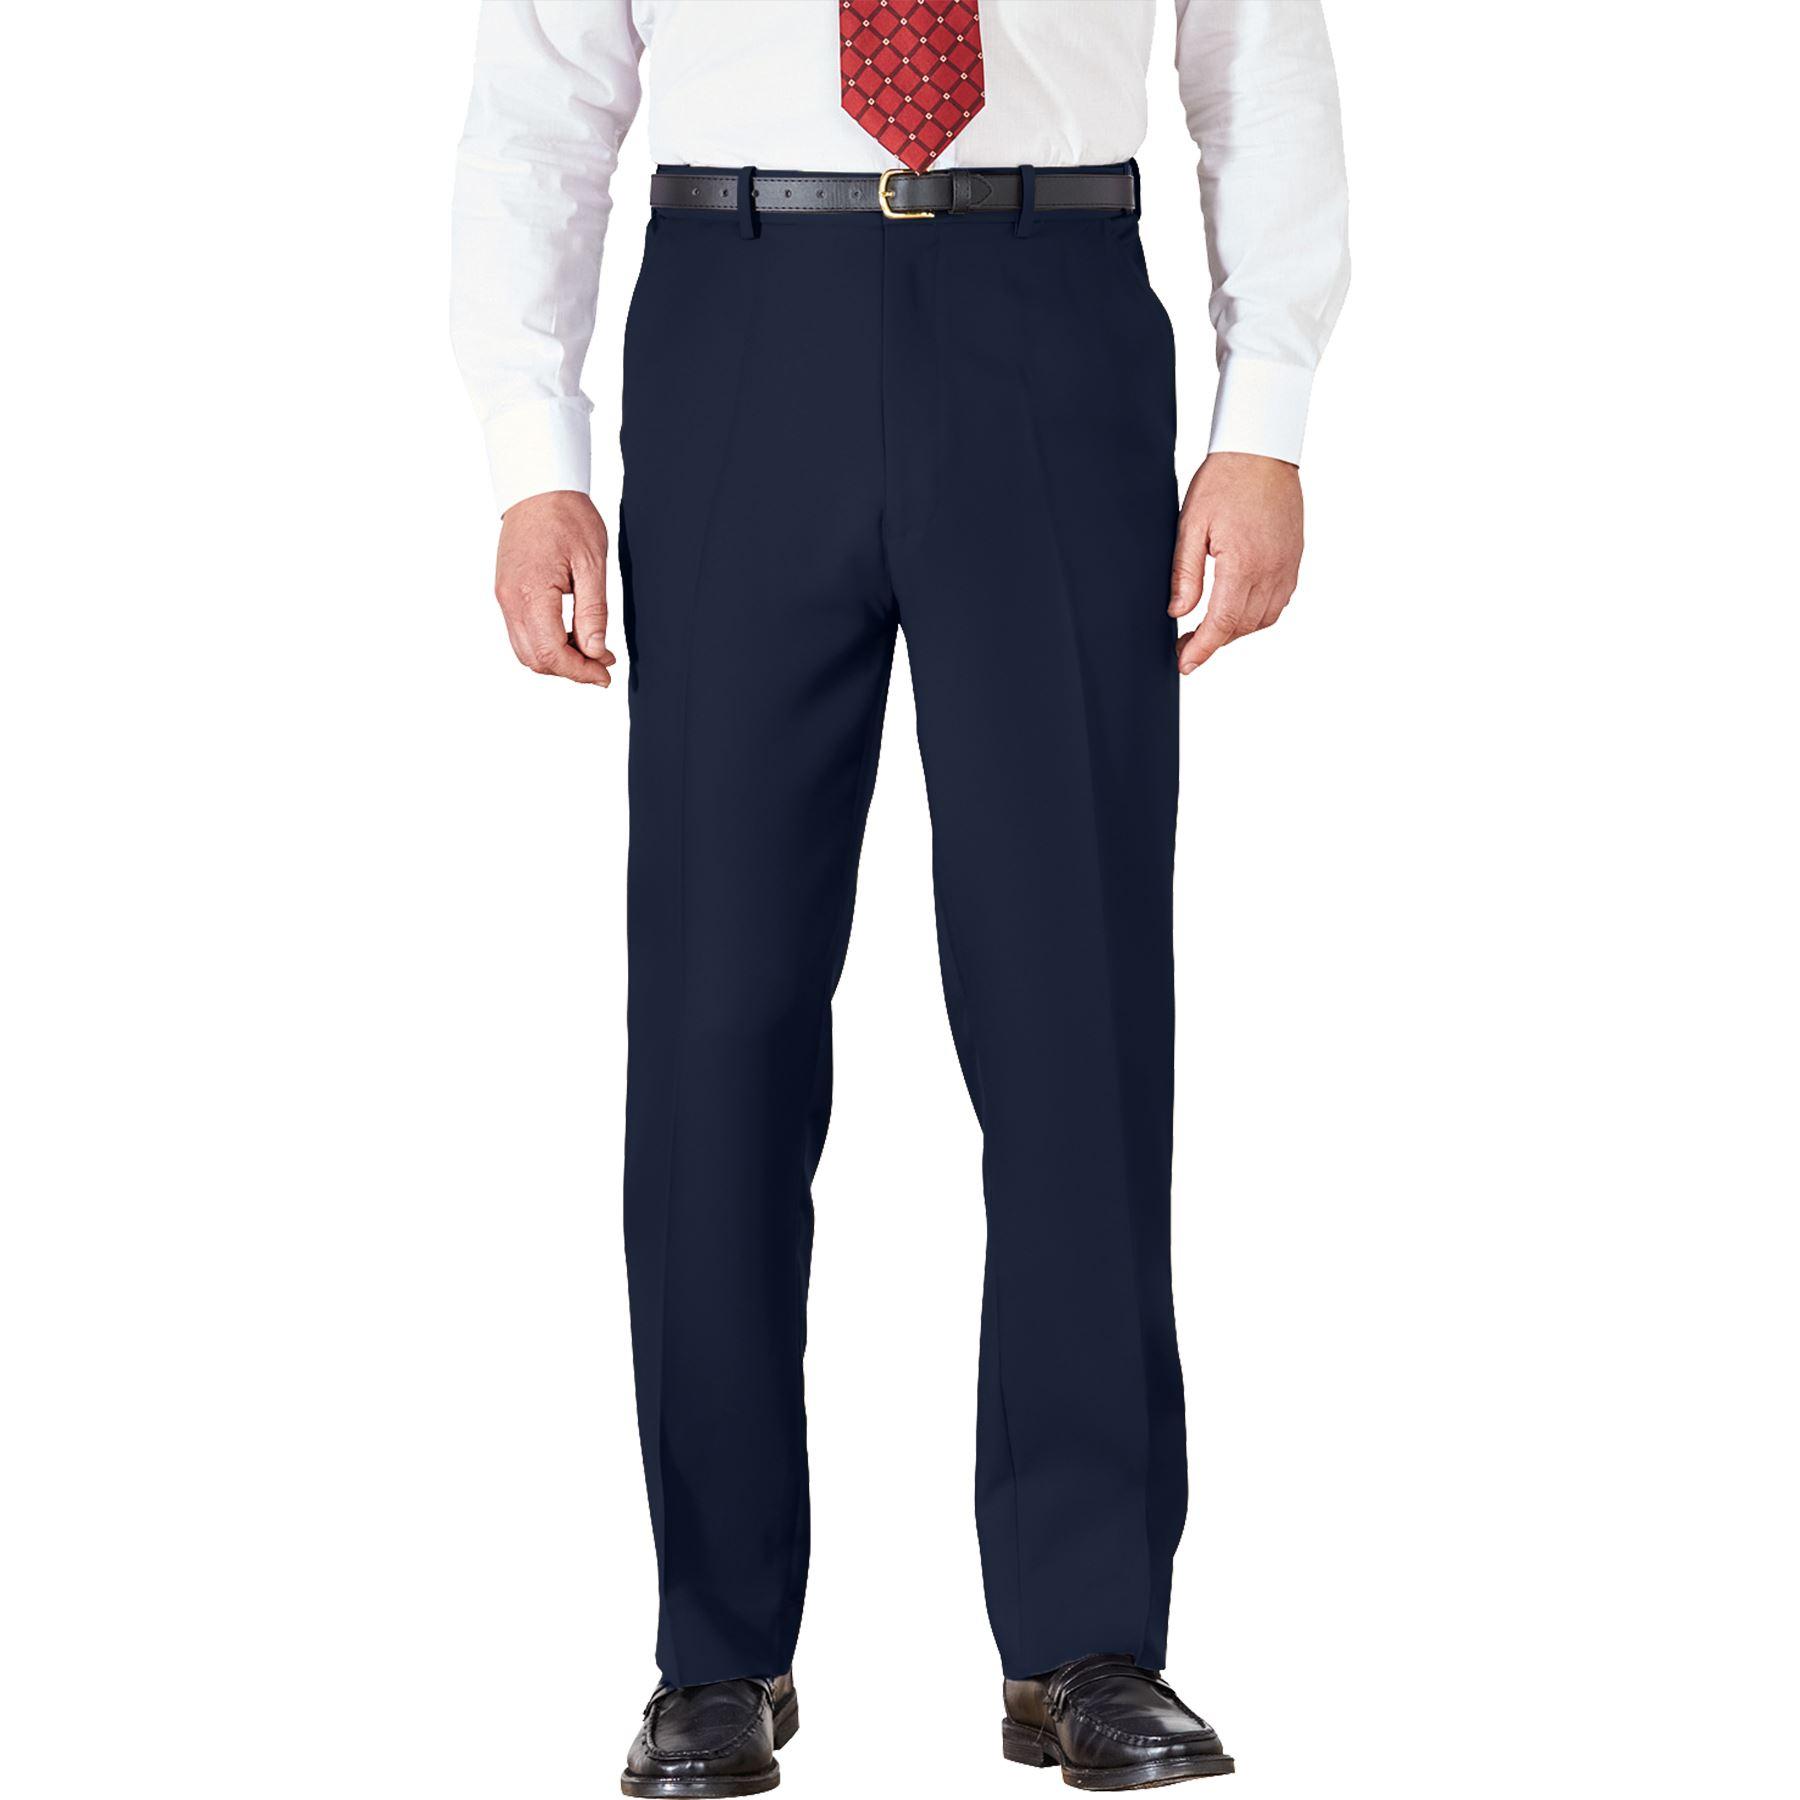 Para-Hombres-Pantalones-Regular-Fit-Straight-Chino-De-Algodon-Informales-Pantalones-de-trabajo miniatura 5